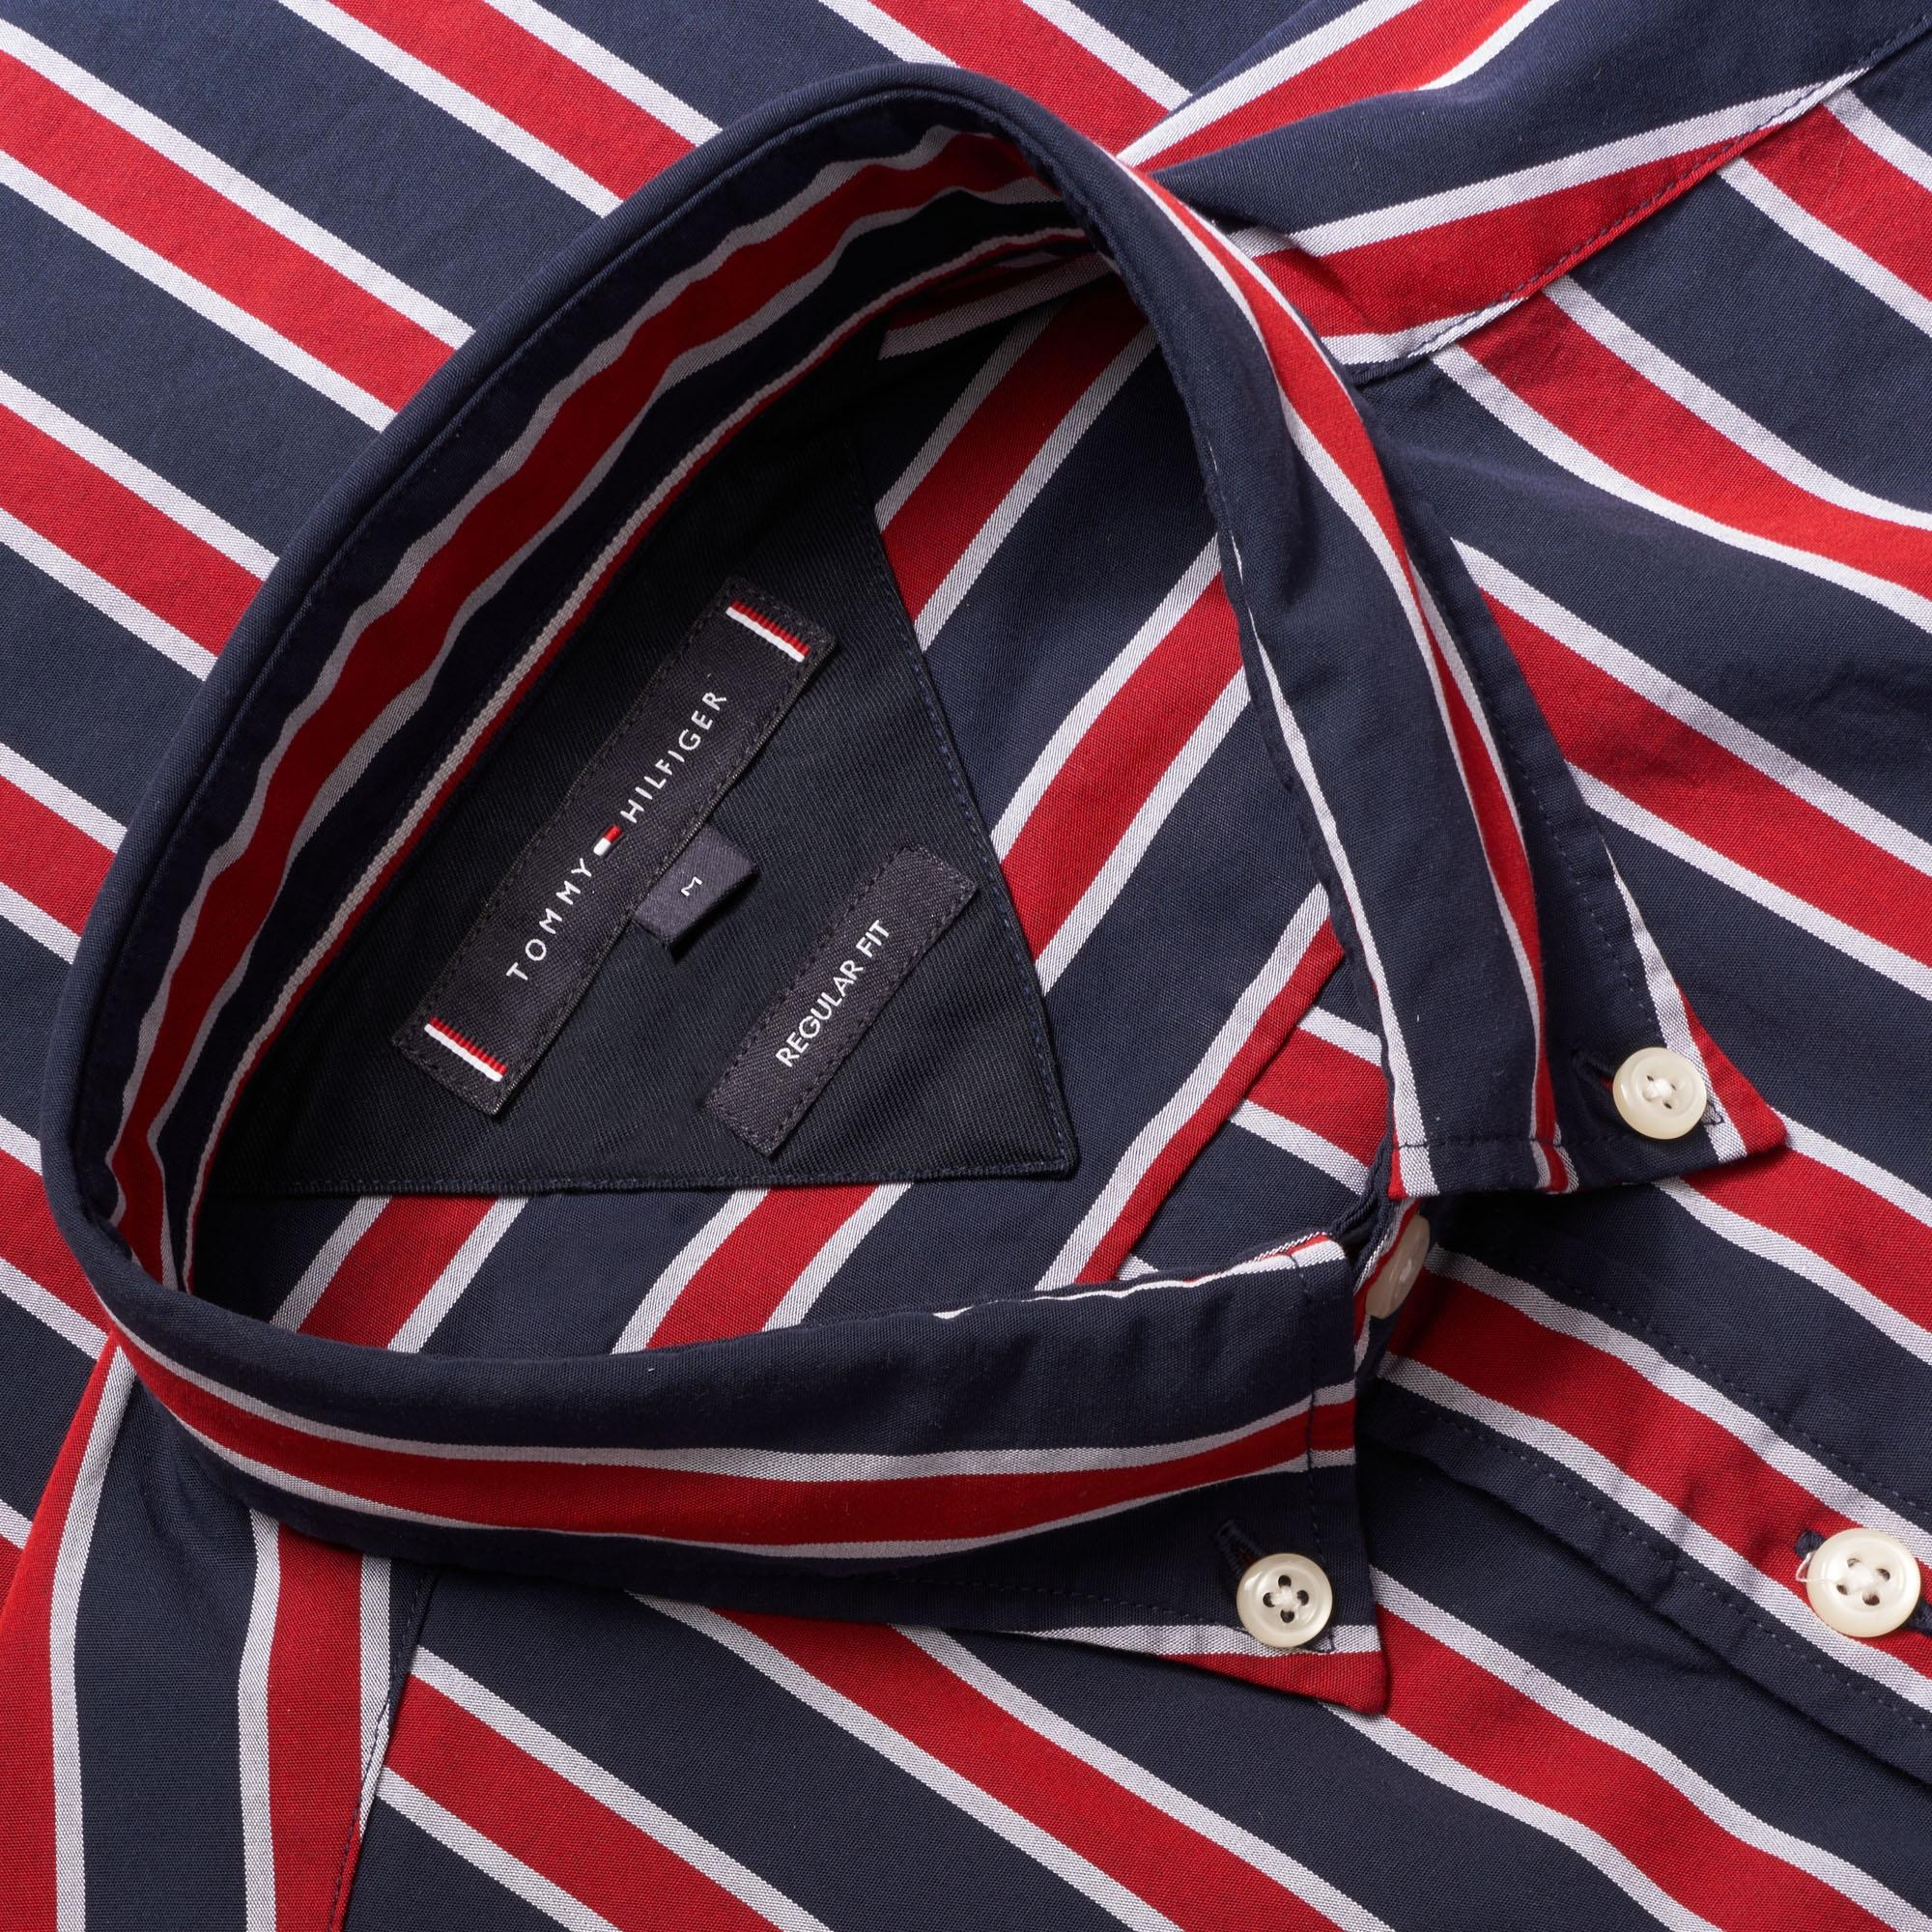 3cbd3712 Tommy Hilfiger - Regimental Stripe Shirt - Haute Red & Black Iris for Men -  Lyst. View fullscreen